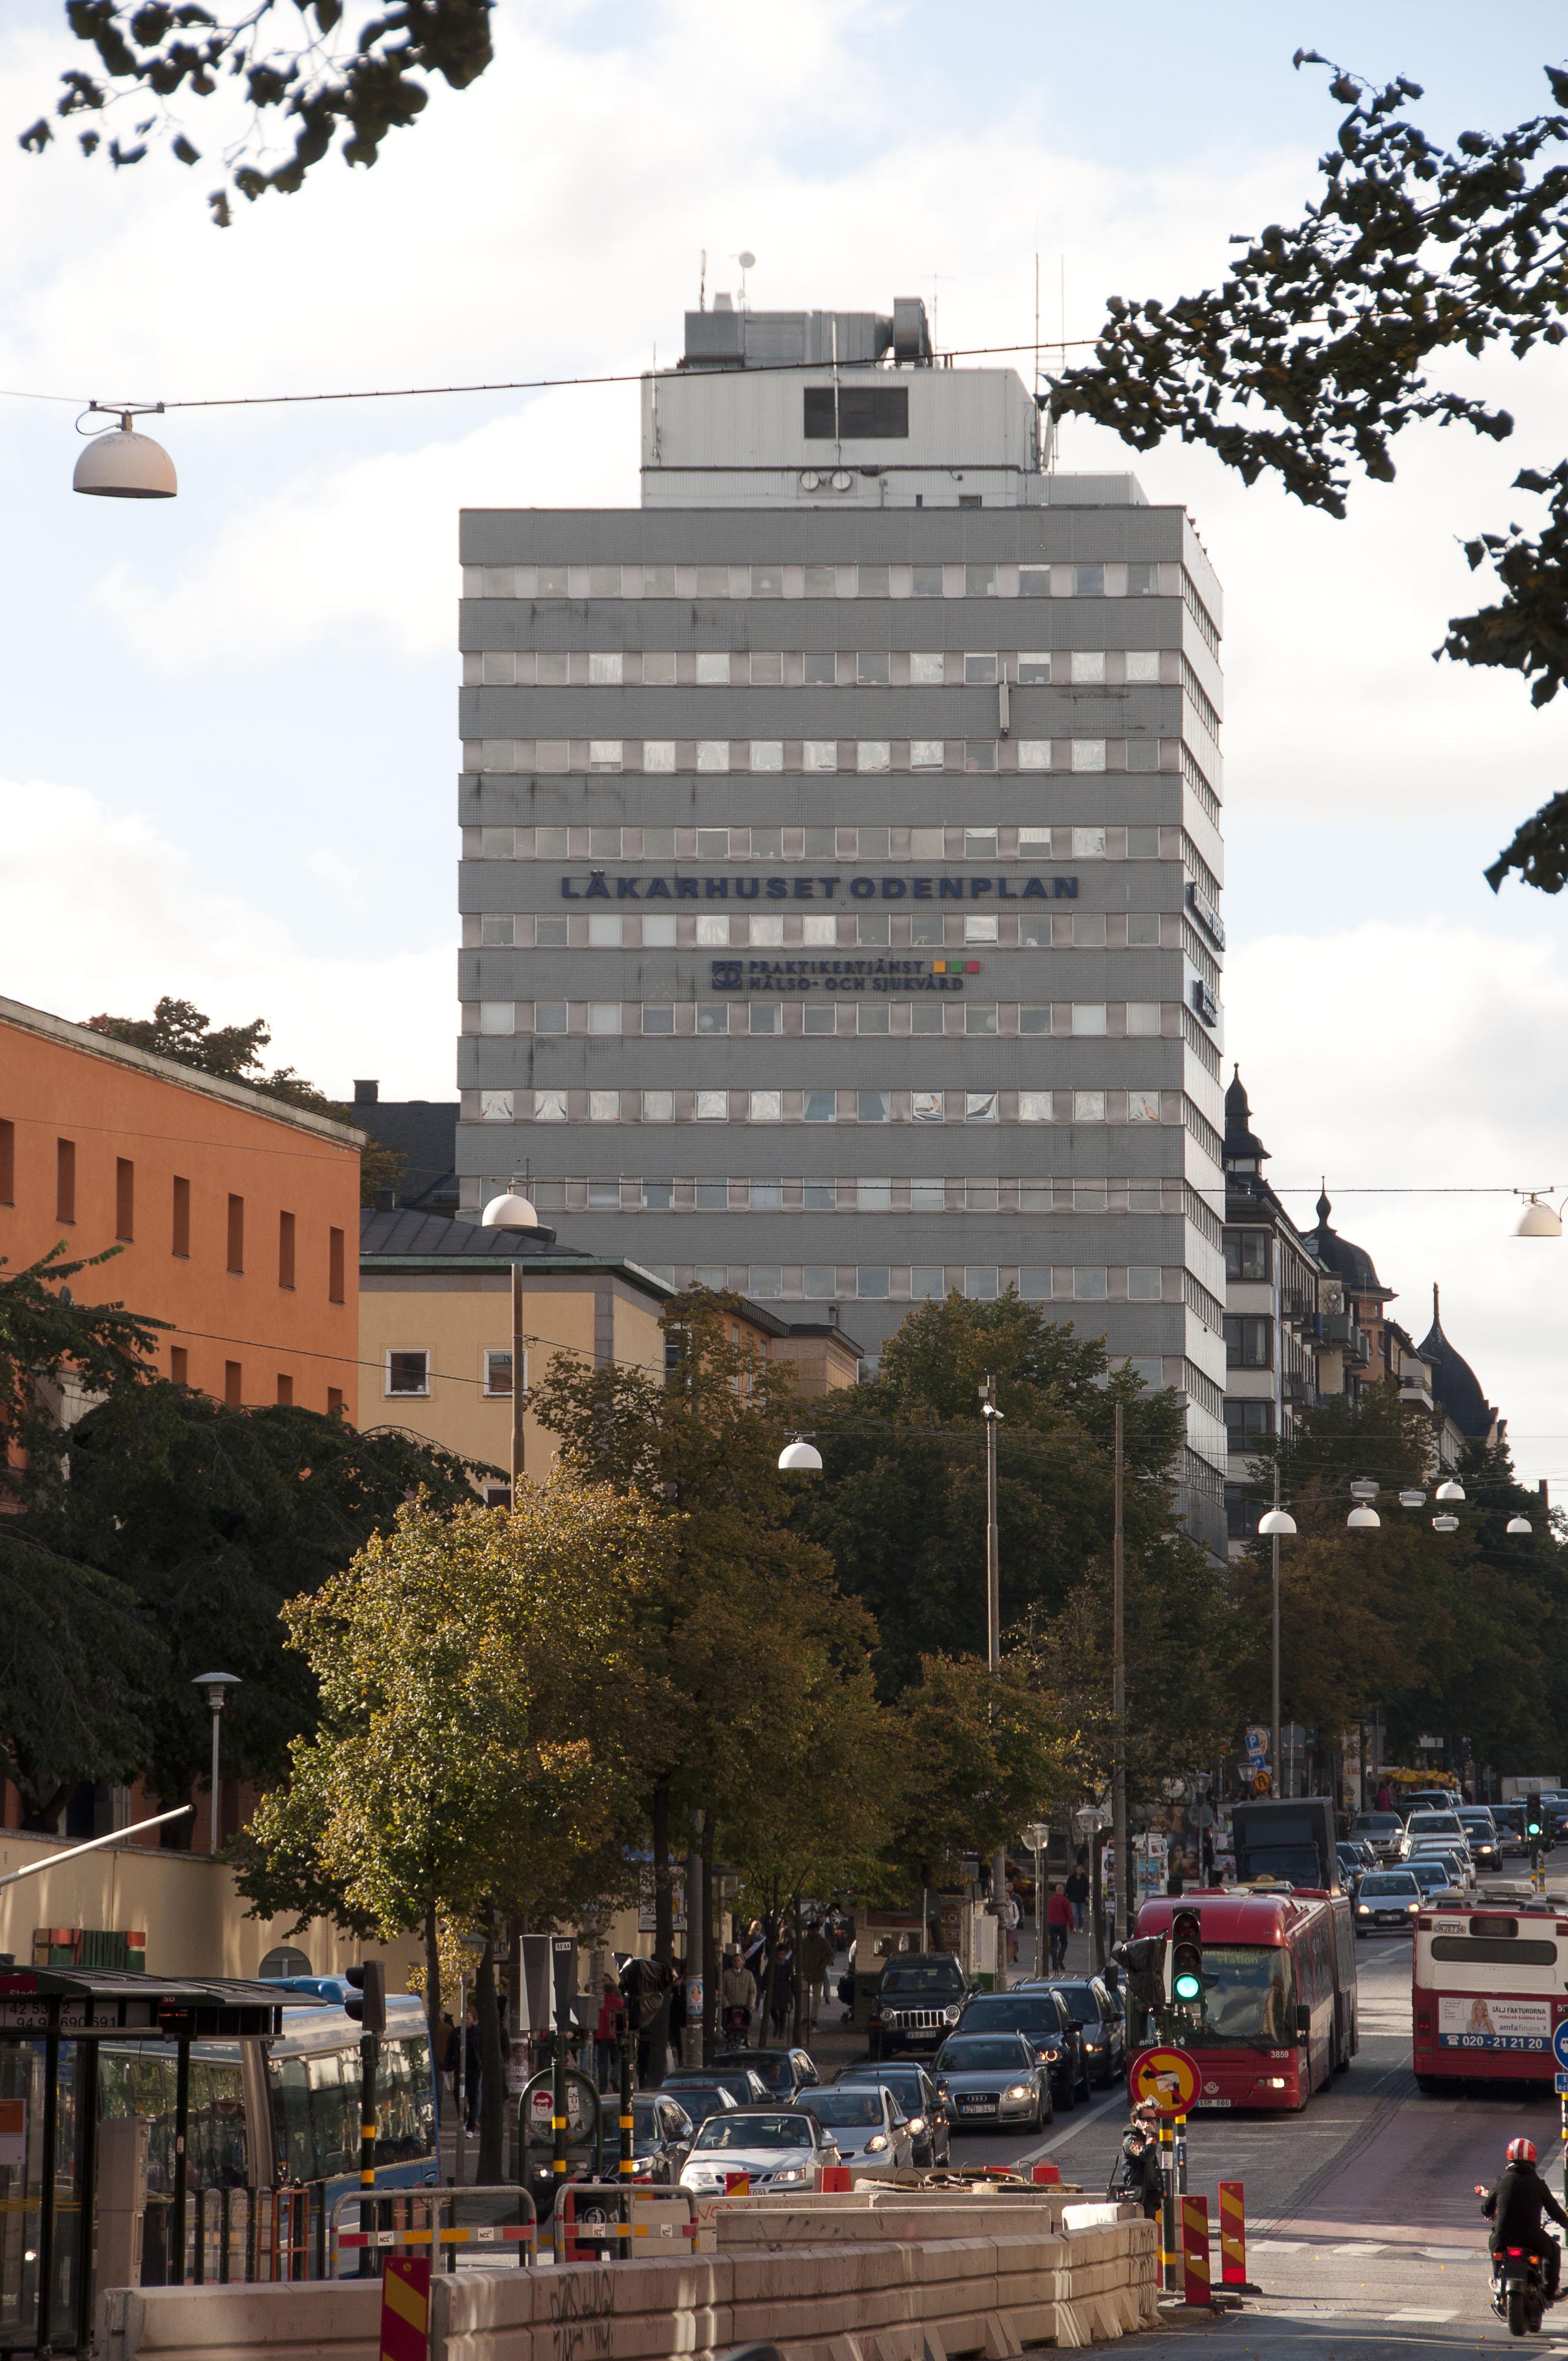 8d95846781f File:Läkarhuset, Odenplan.JPG - Wikimedia Commons